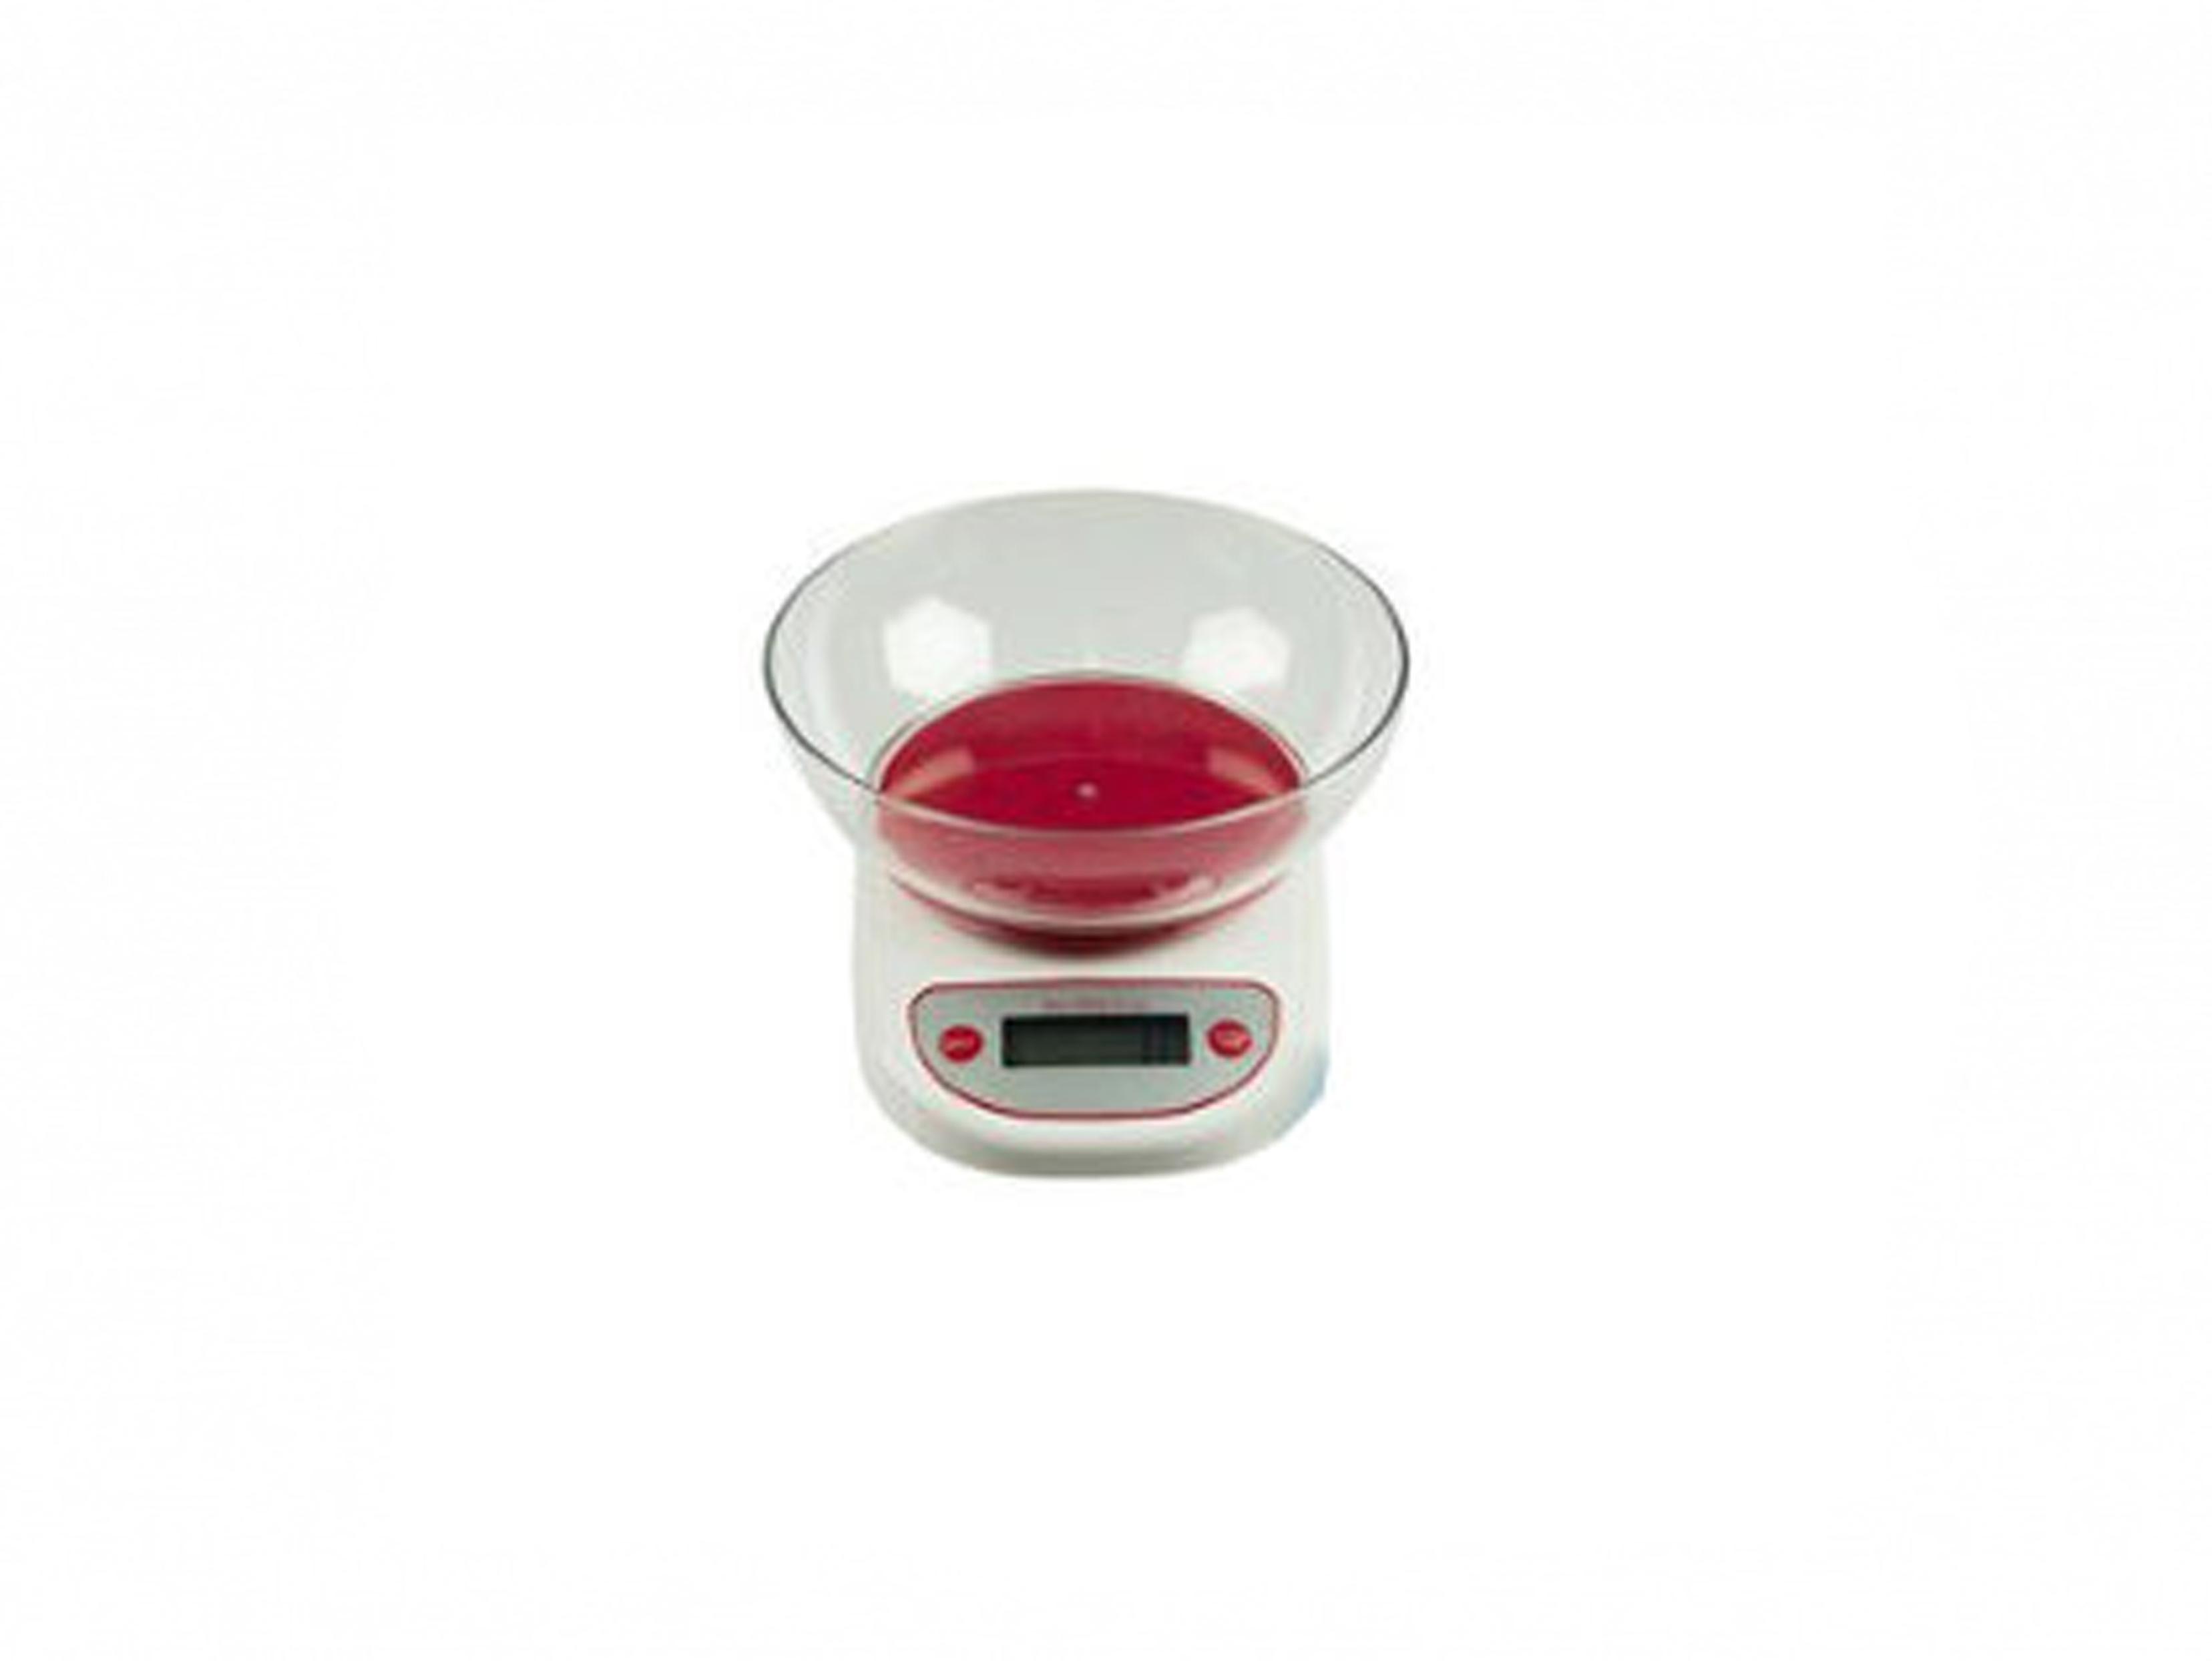 Alpina 93491 Ψηφιακή Ζυγαριά Κουζίνας έως 5Kg Κόκκινο - Alpina οργάνωση κουζίνας   ζυγαριές κουζίνας